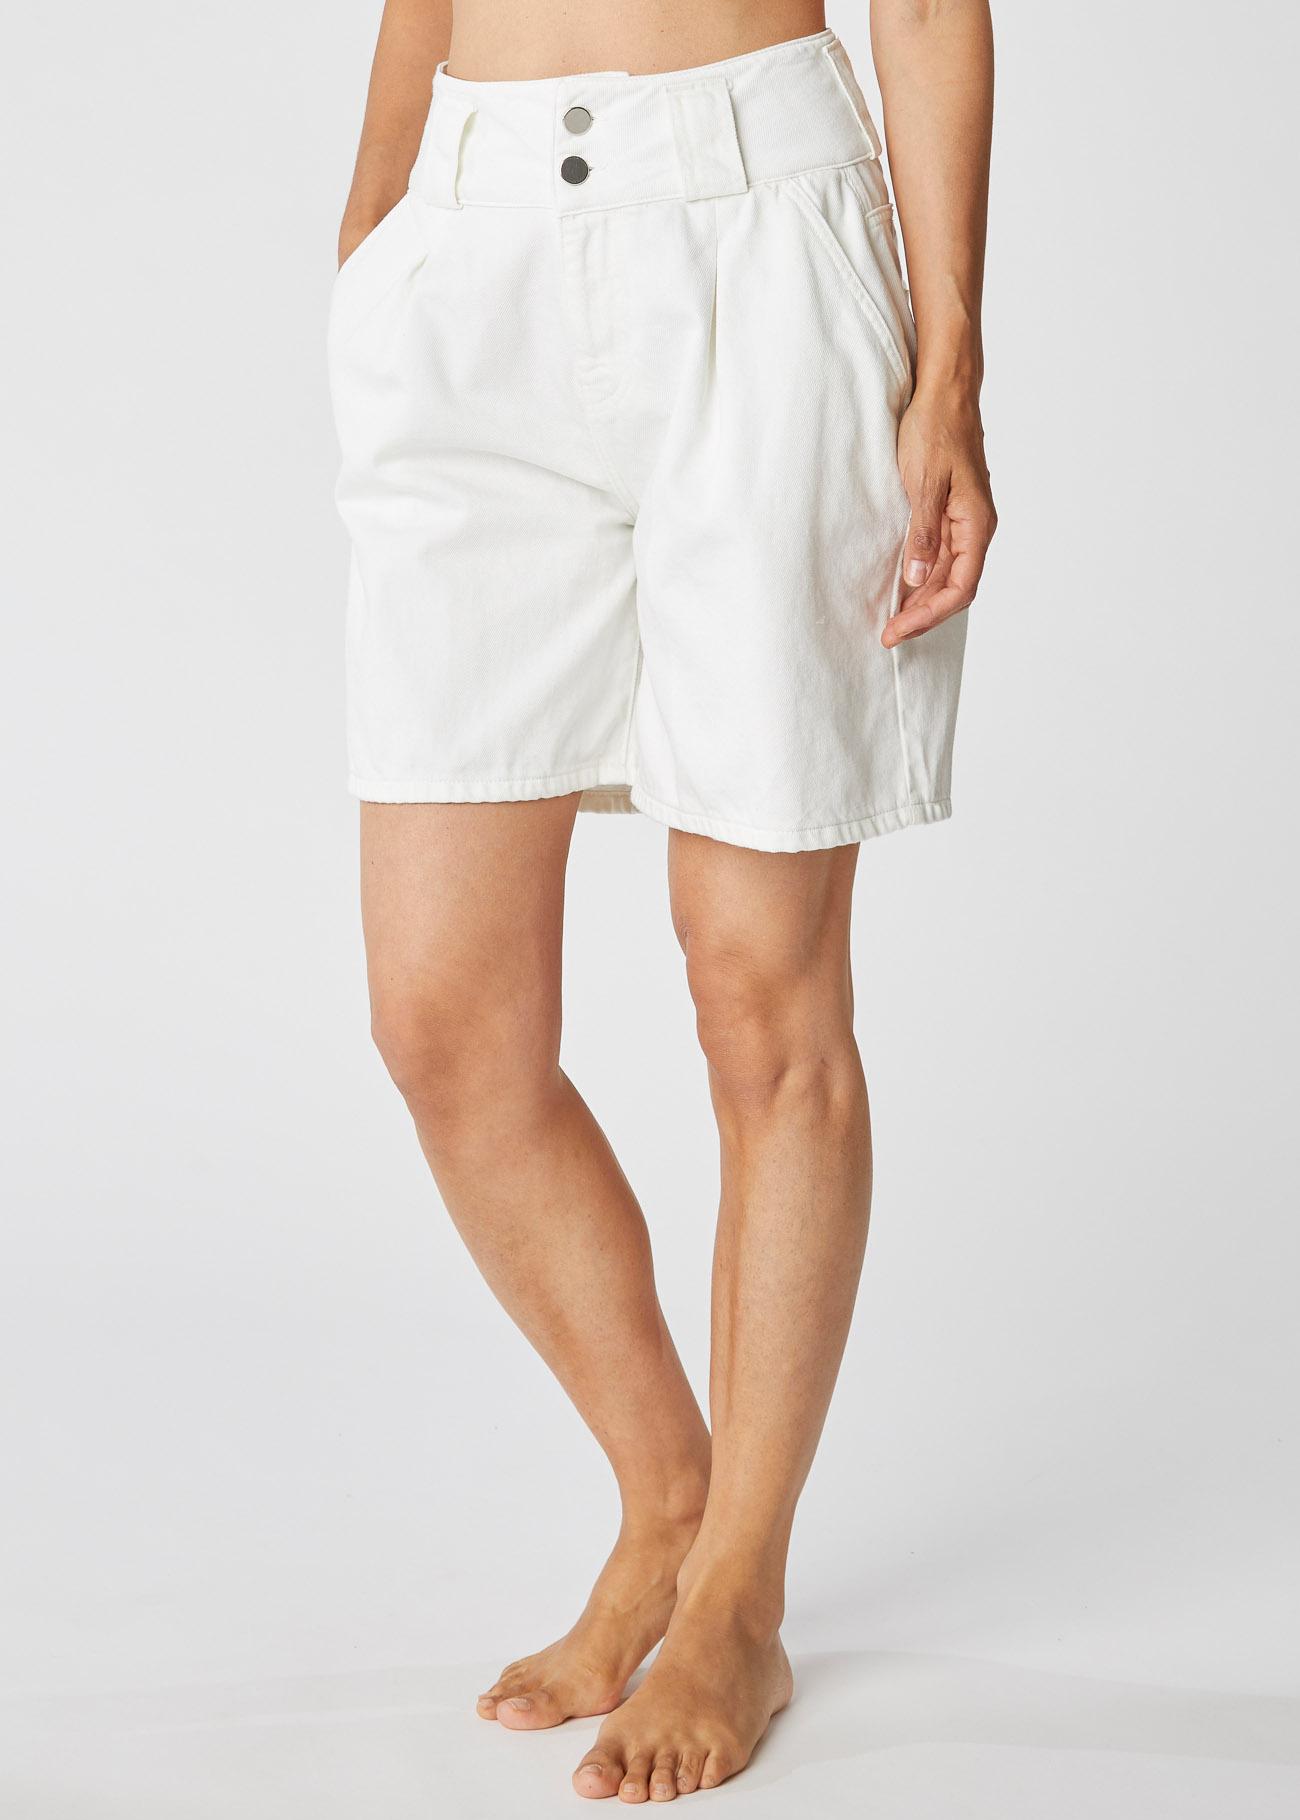 High-waisted white denim bermuda shorts ALESSIA SANTI | Shorts | 26002119035-01